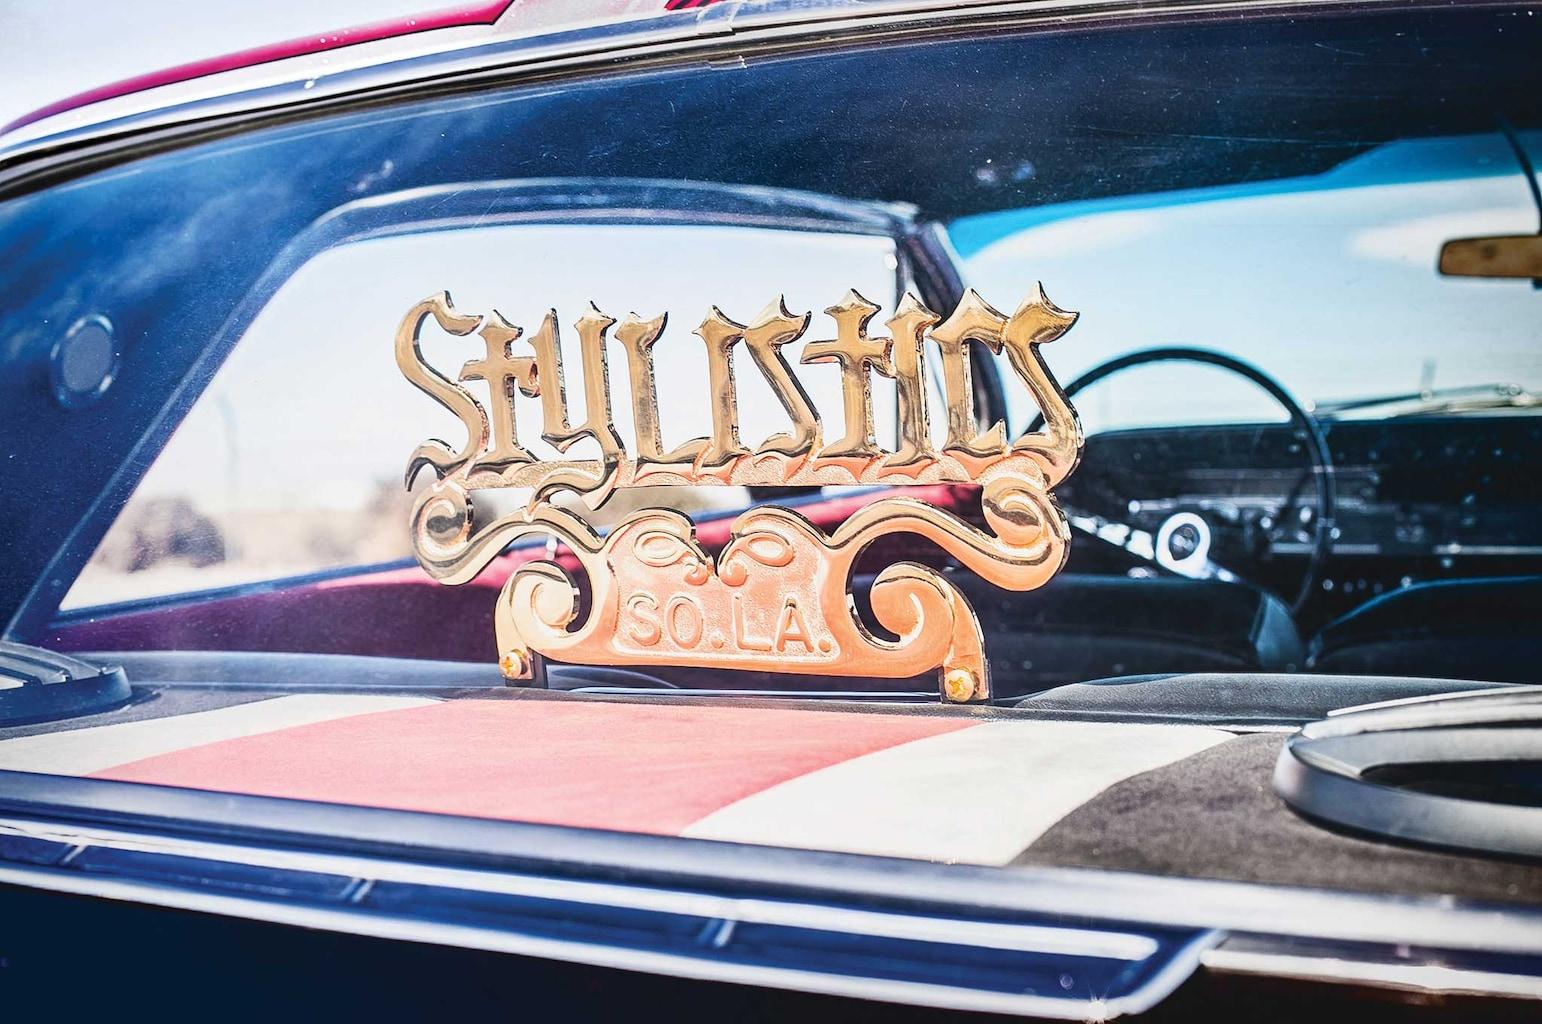 1962 chevrolet impala stylistics club plaque 005